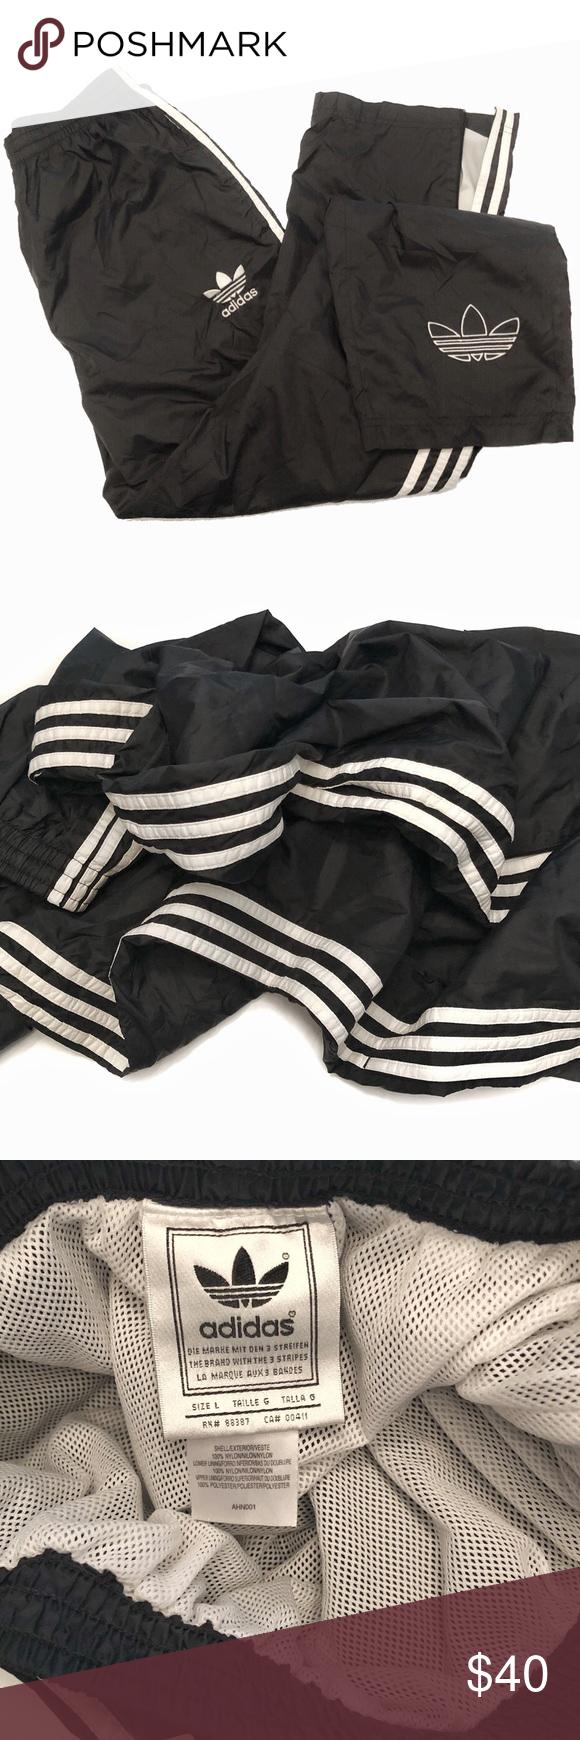 Pantalones chándal de chándal Adidas w Originals w |/ Trefoil Logo | b33ff1f - colja.host